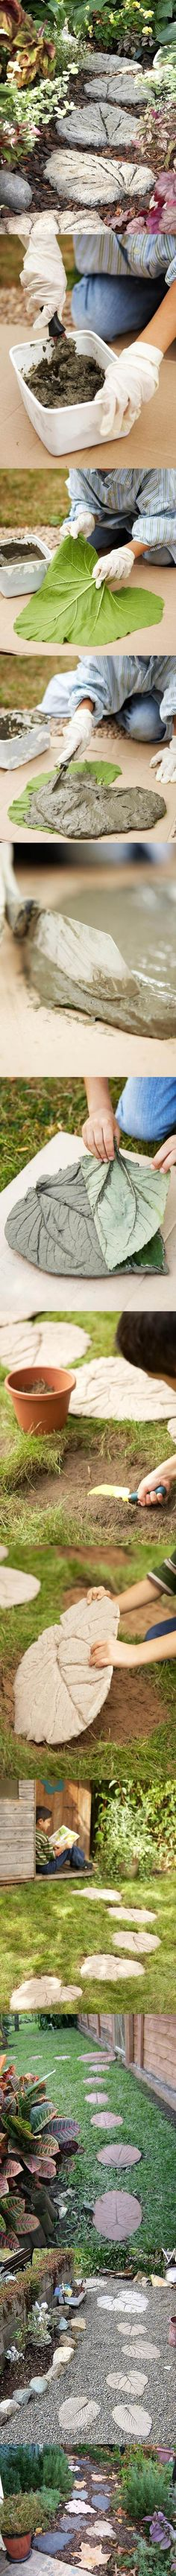 DIY Stone Leaf Garden Path | iCreativeIdeas.com Like Us on Facebook ==> https://www.facebook.com/icreativeideas